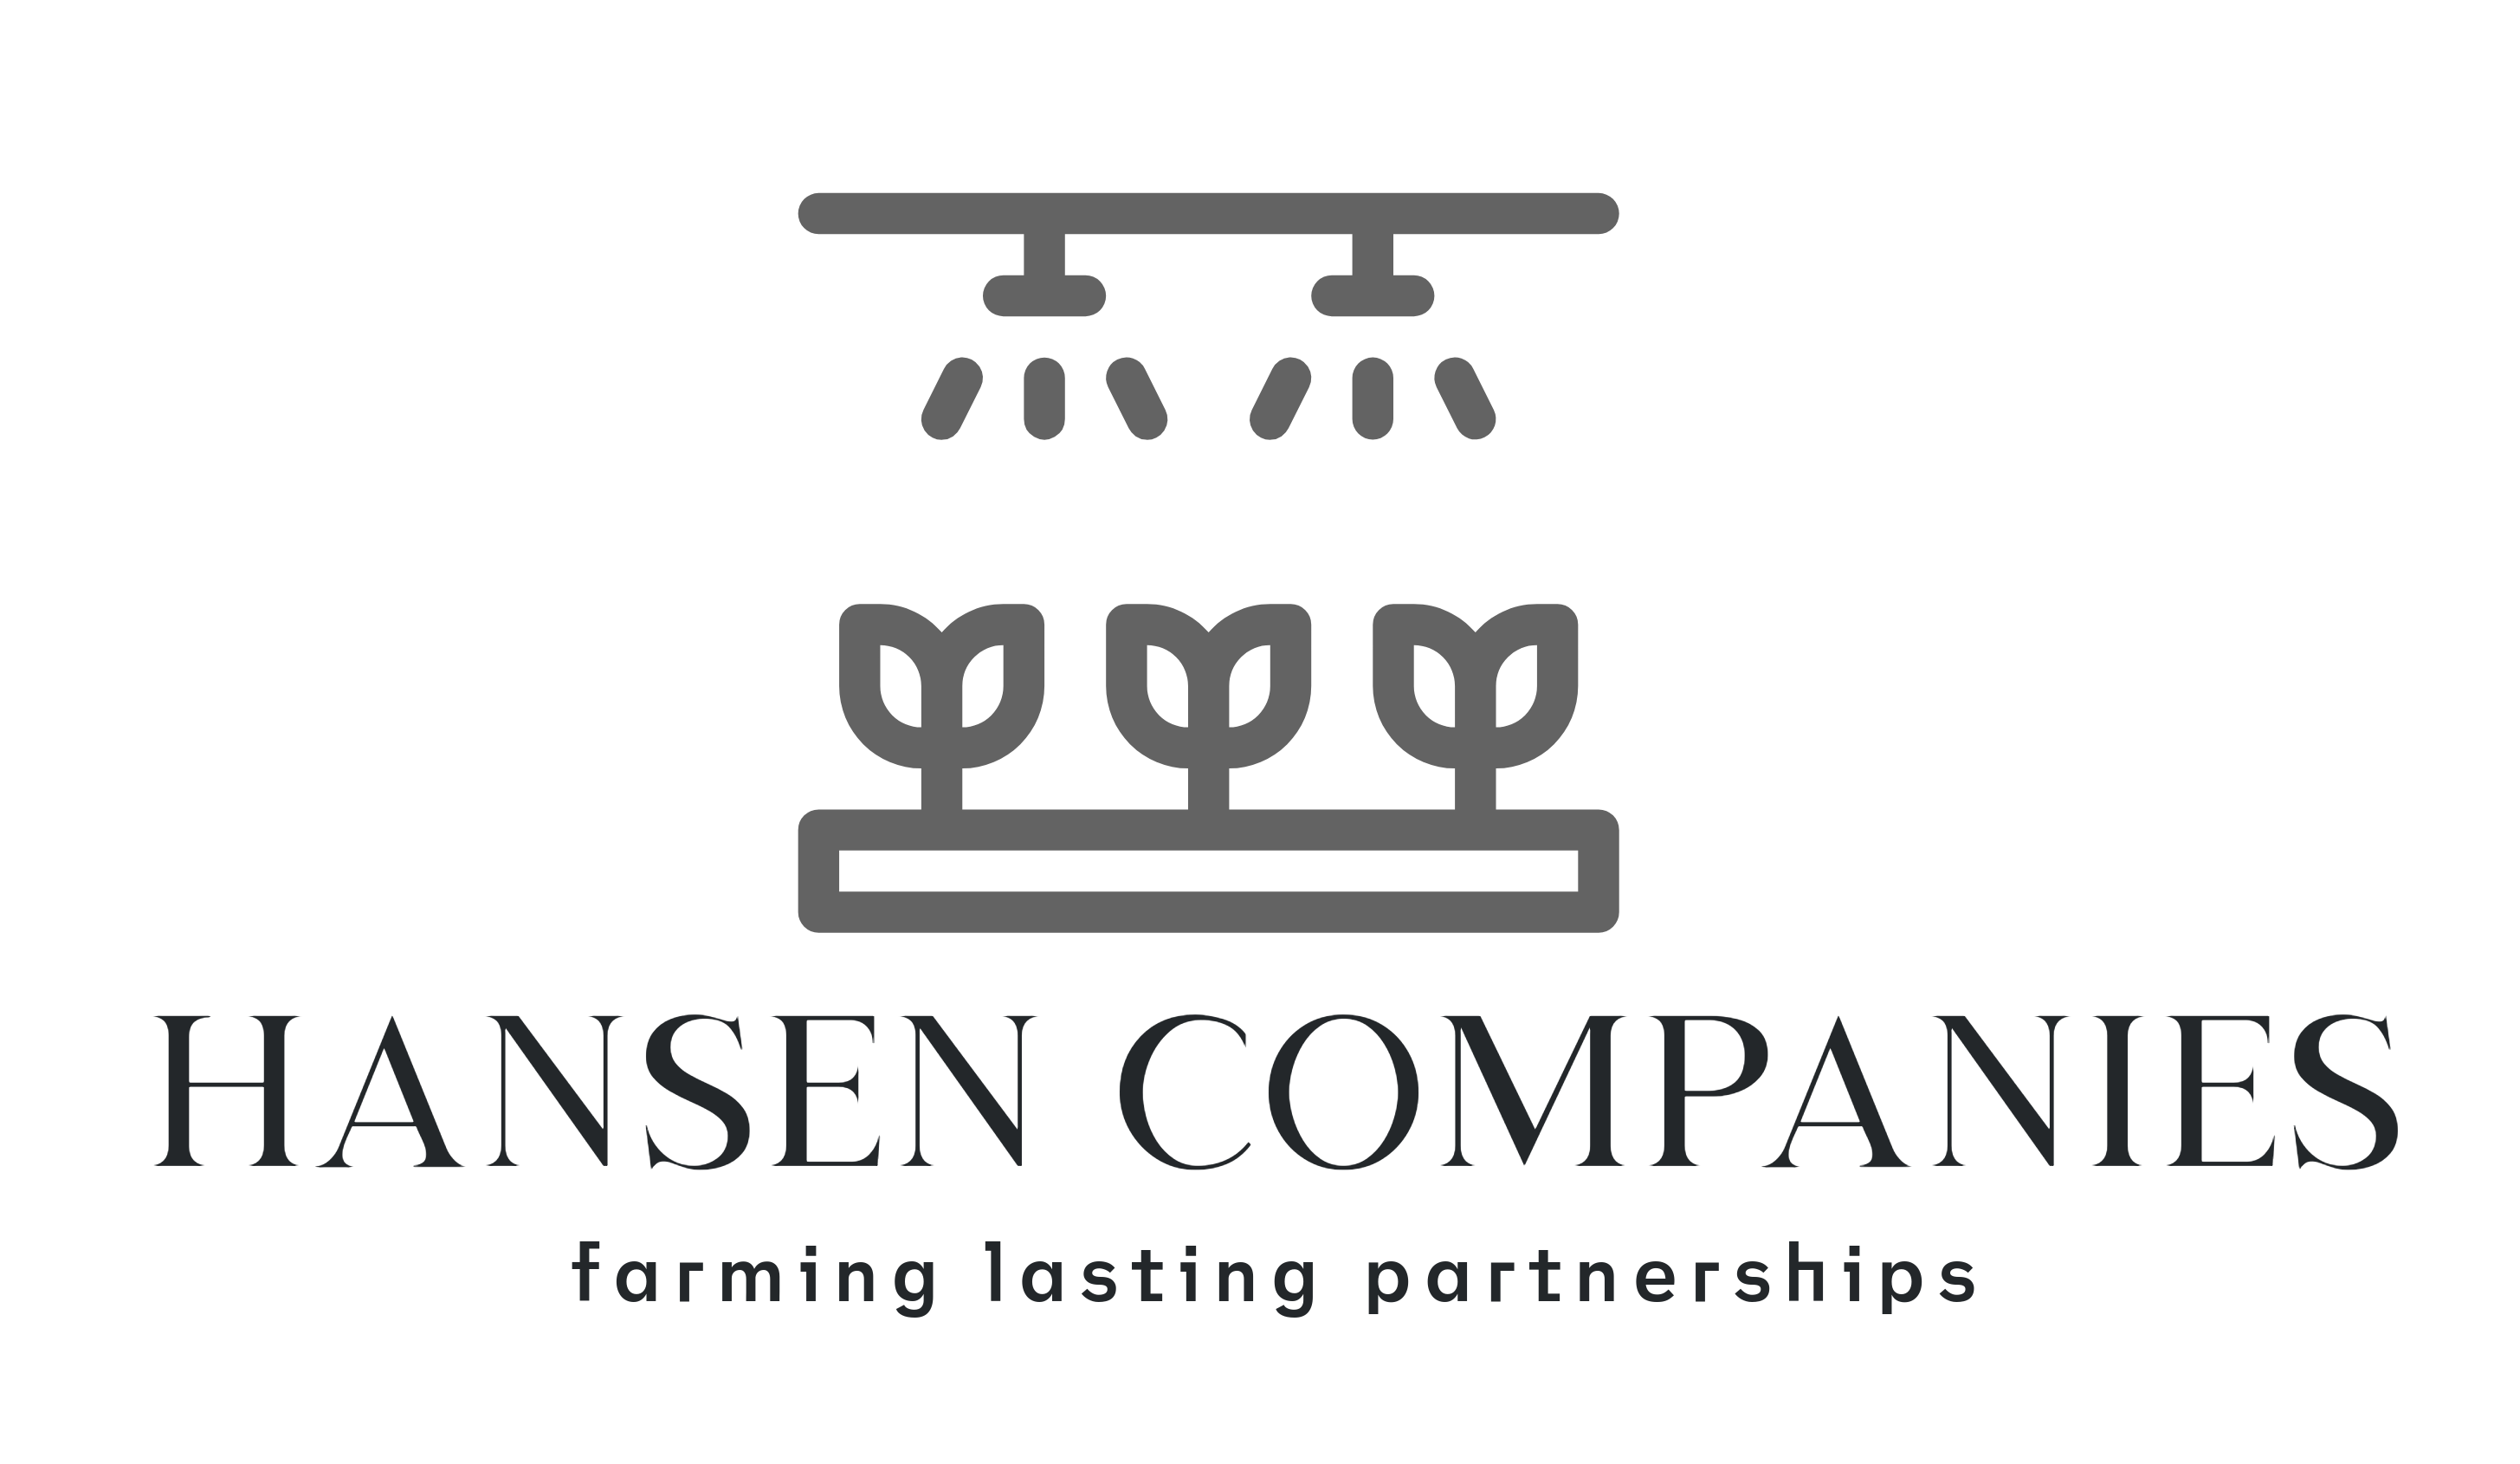 Hansen Companies